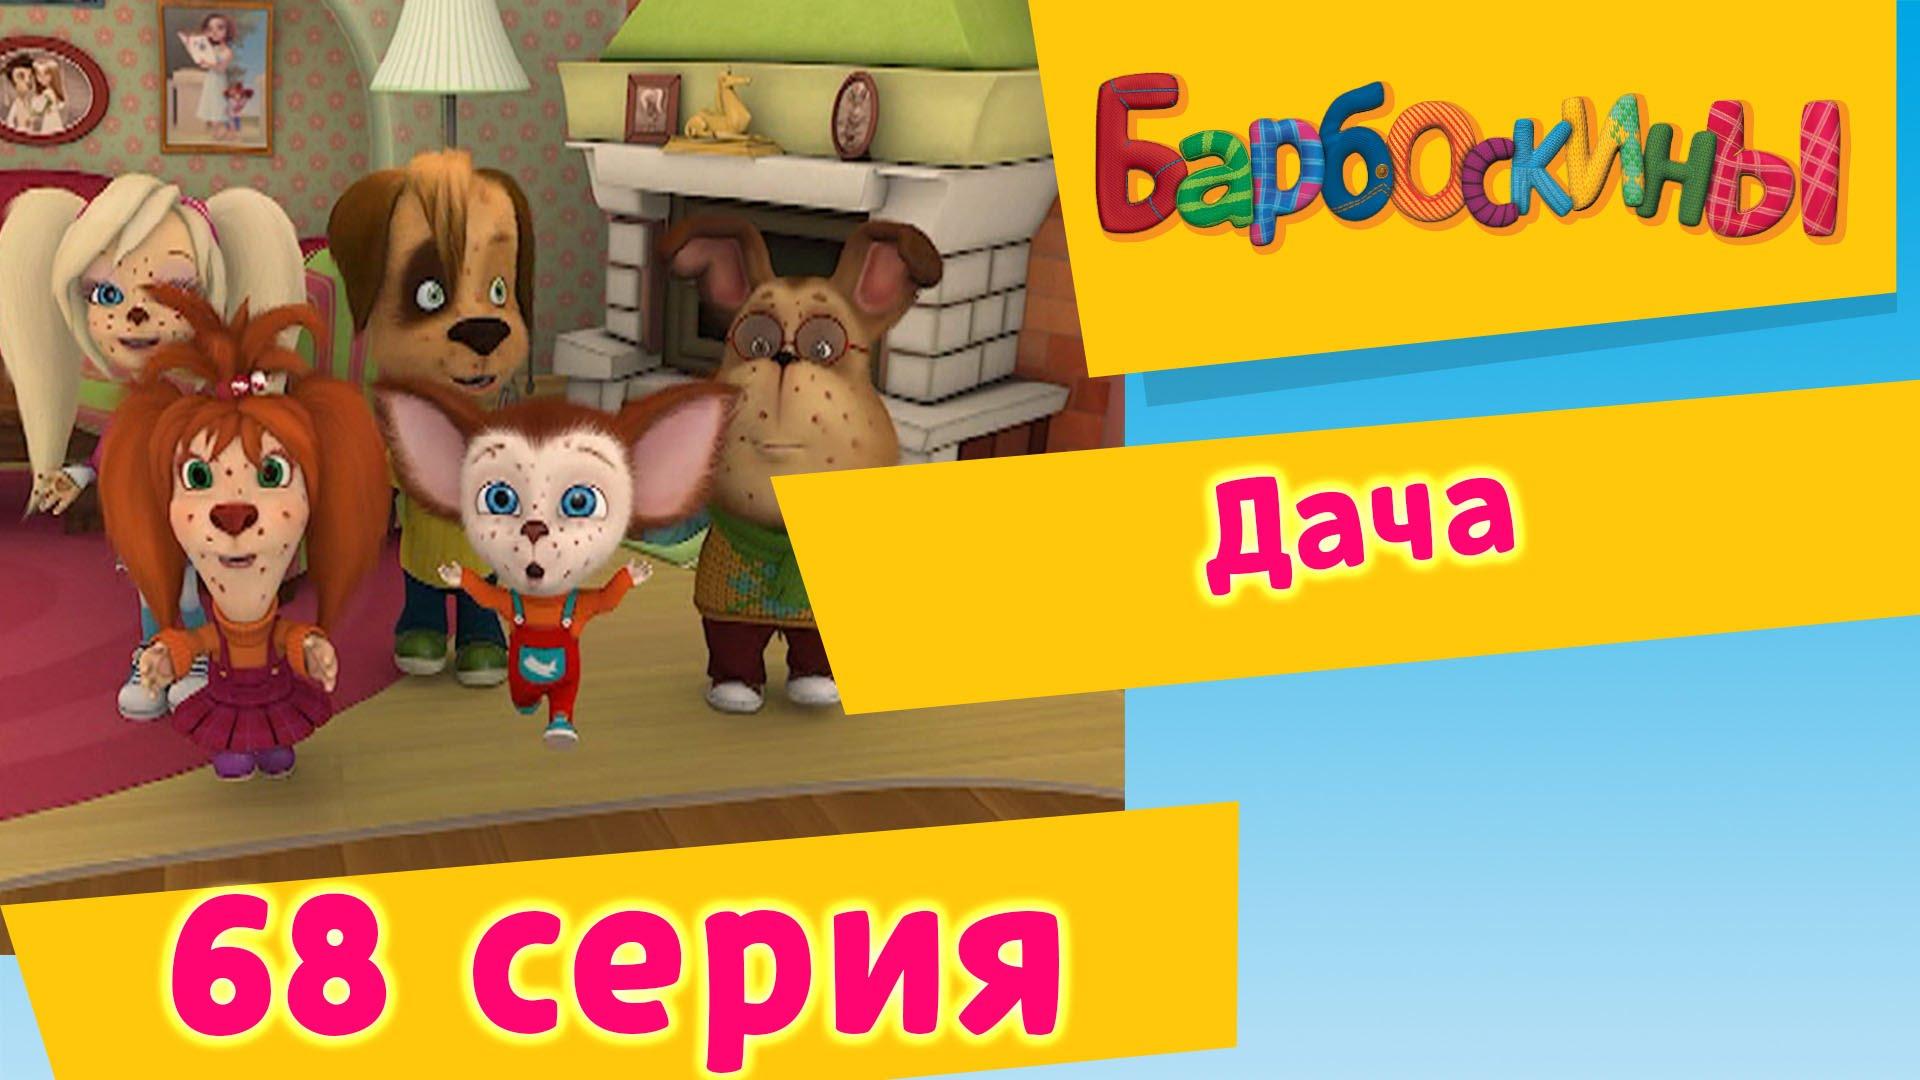 Барбоскины — 68 Серия. Дача